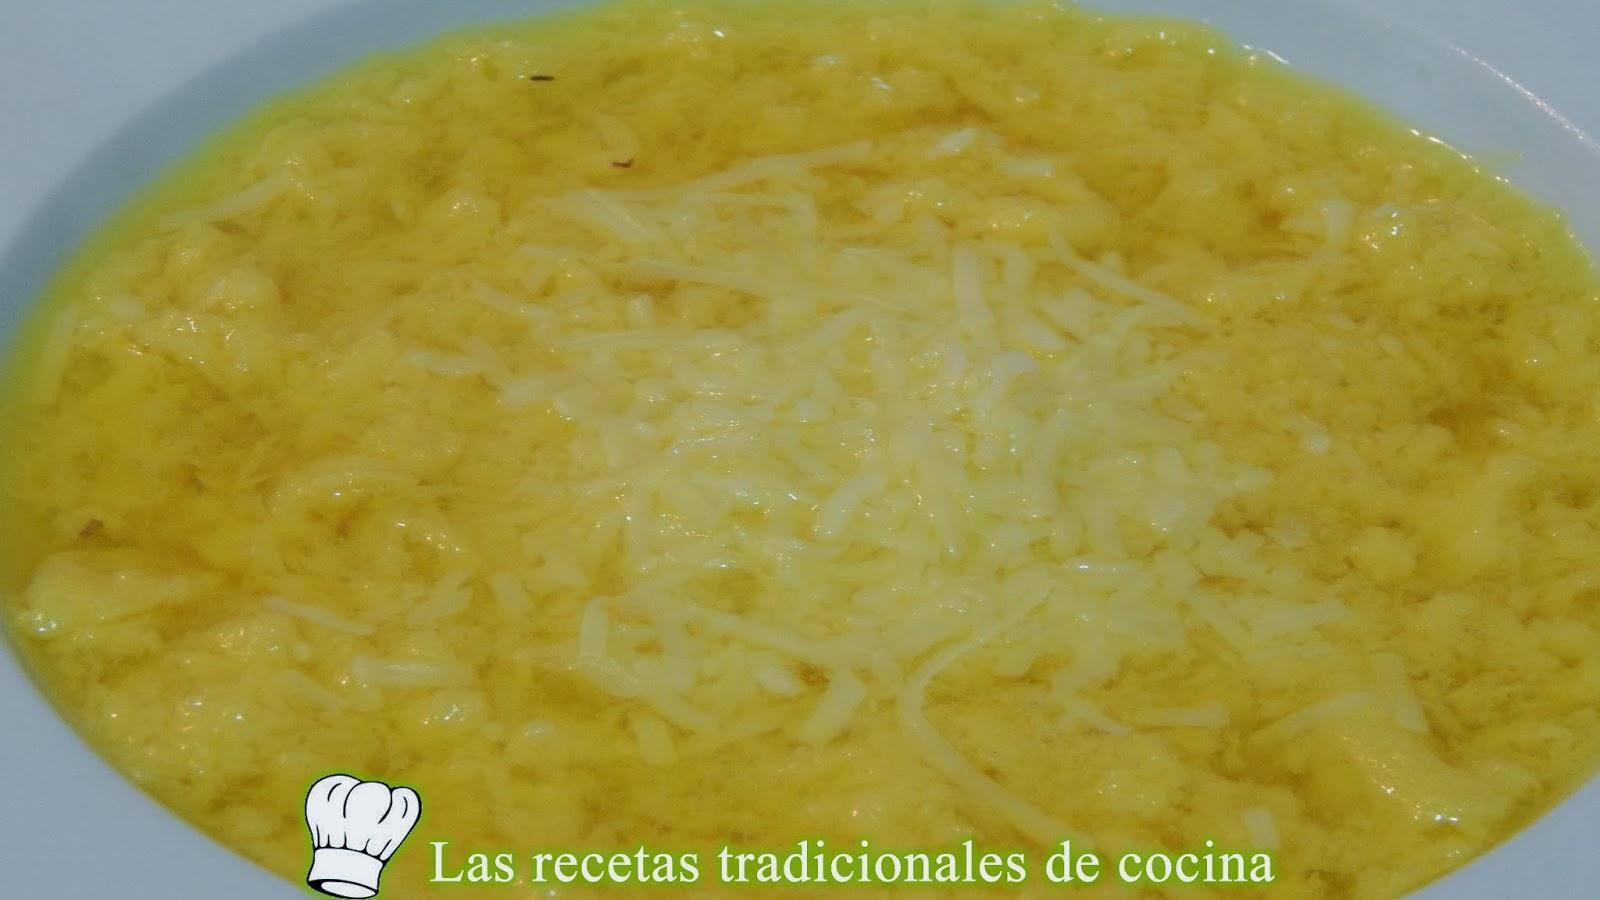 Receta fácil de sopa de huevo hilado